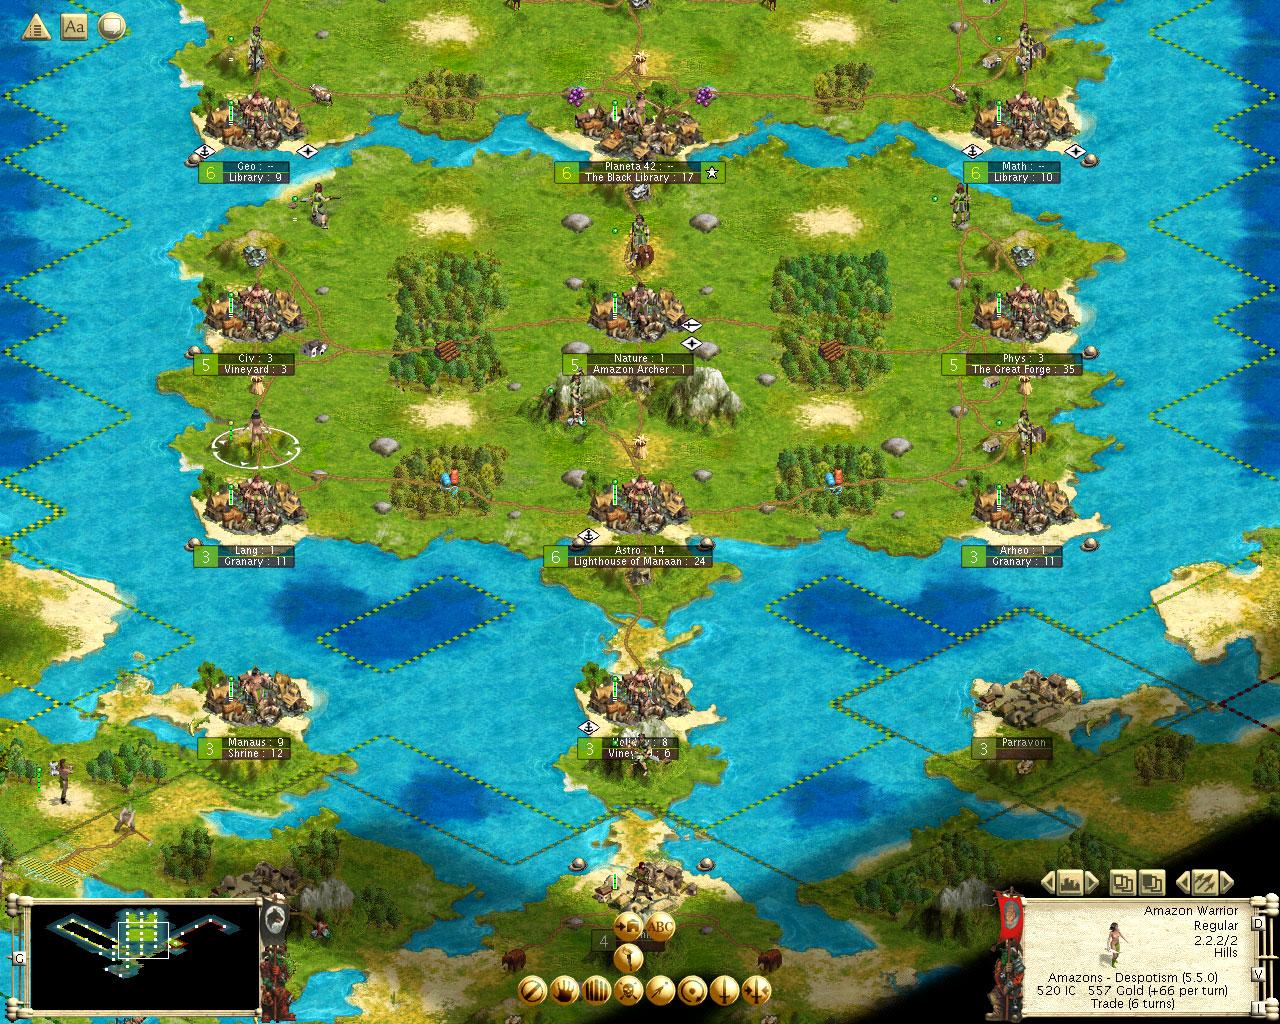 Warhammer Fantasy Mod | Civilization 3 | The Best Games Ever